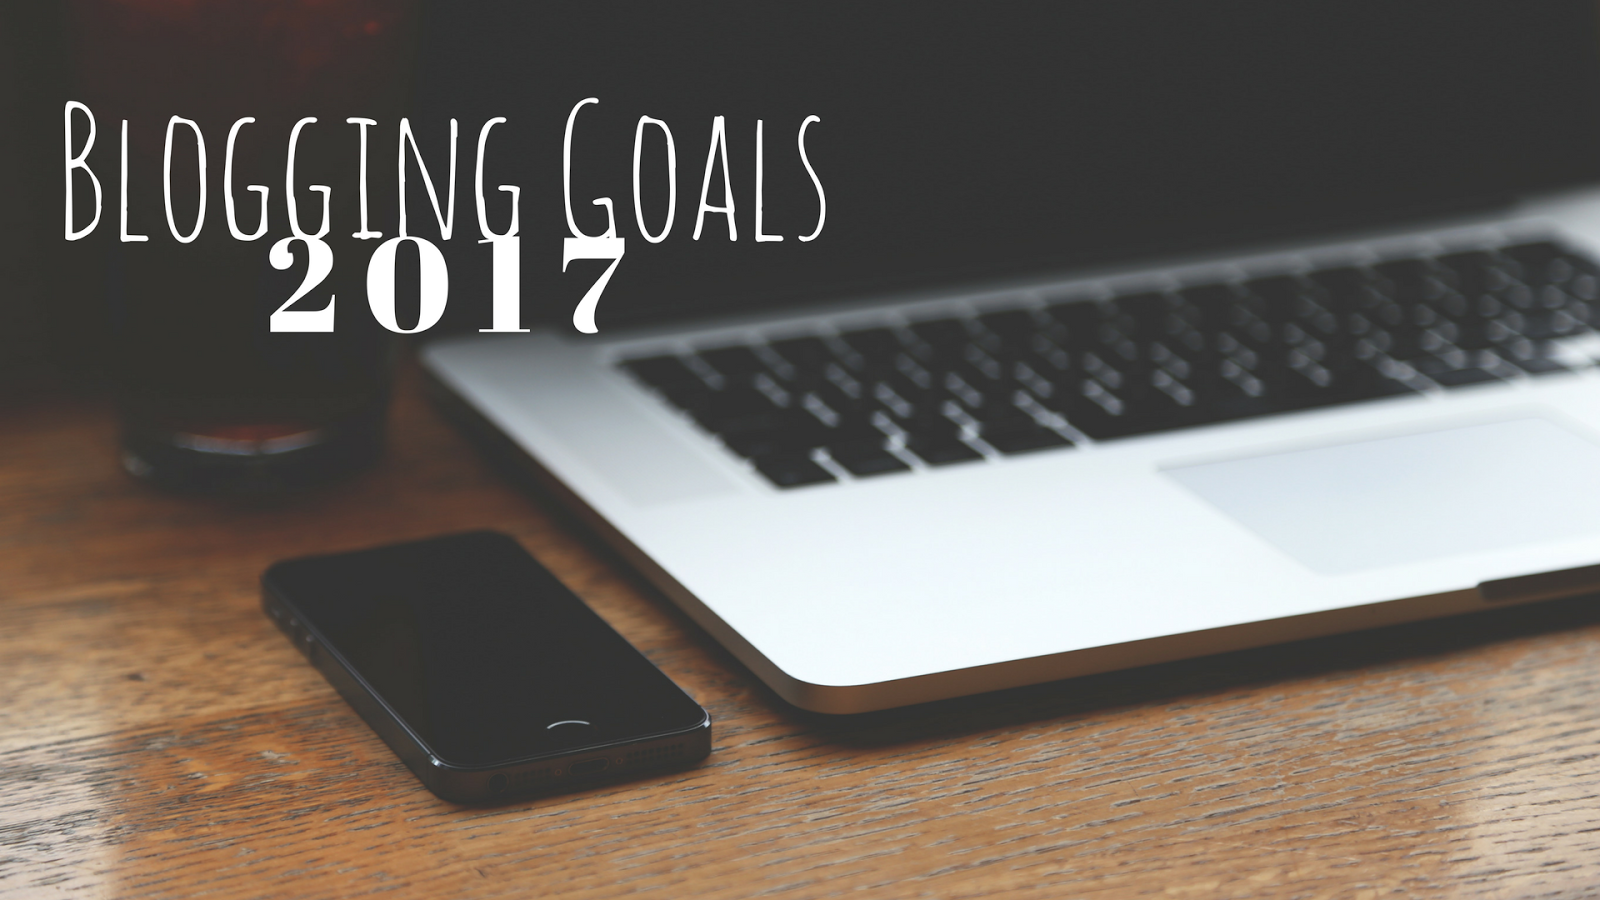 lifestyle, goals, bucket list, blogging, twitter, facebook, social media, job, work